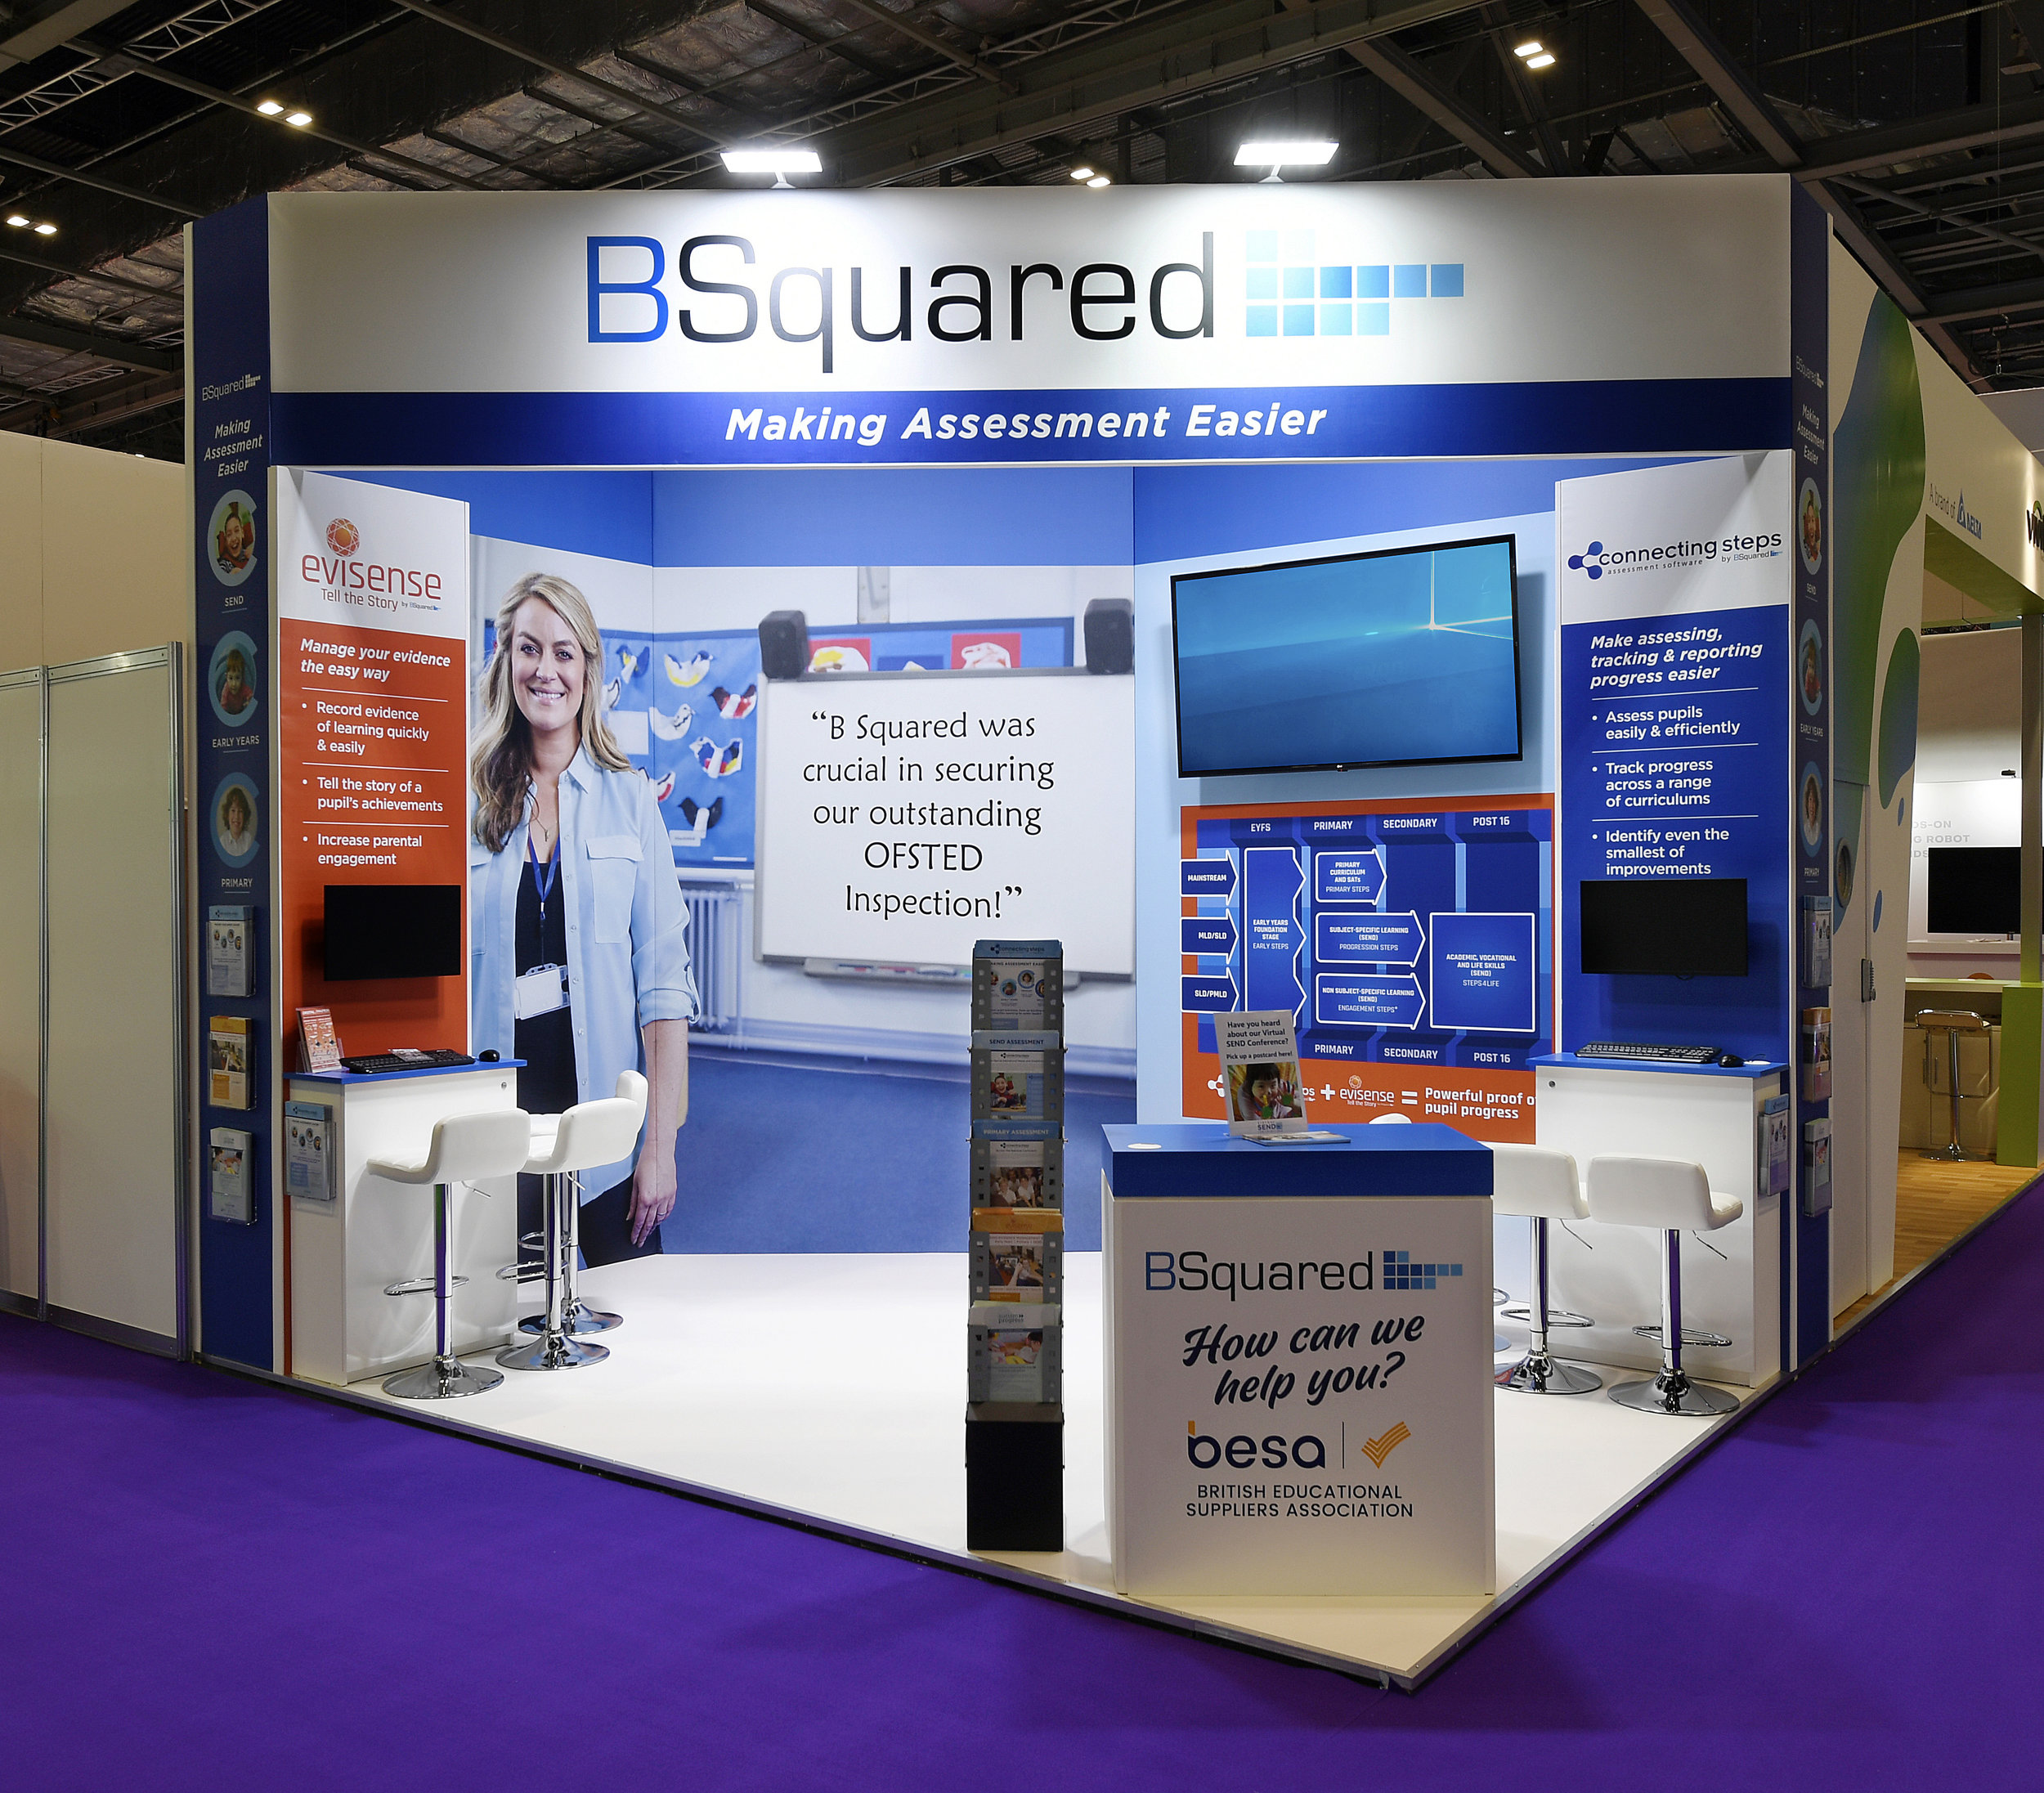 B Squared Exhibition Stand Design